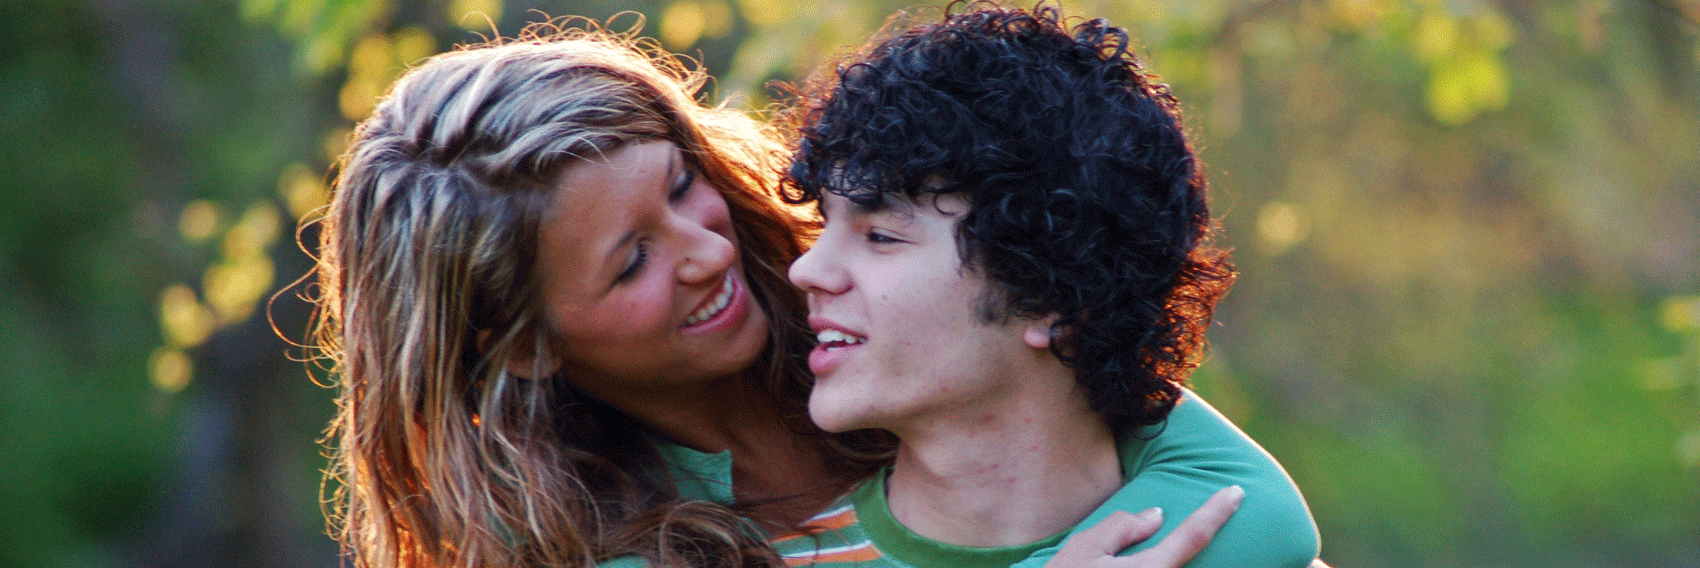 9 Secrets Of A Great Relationship